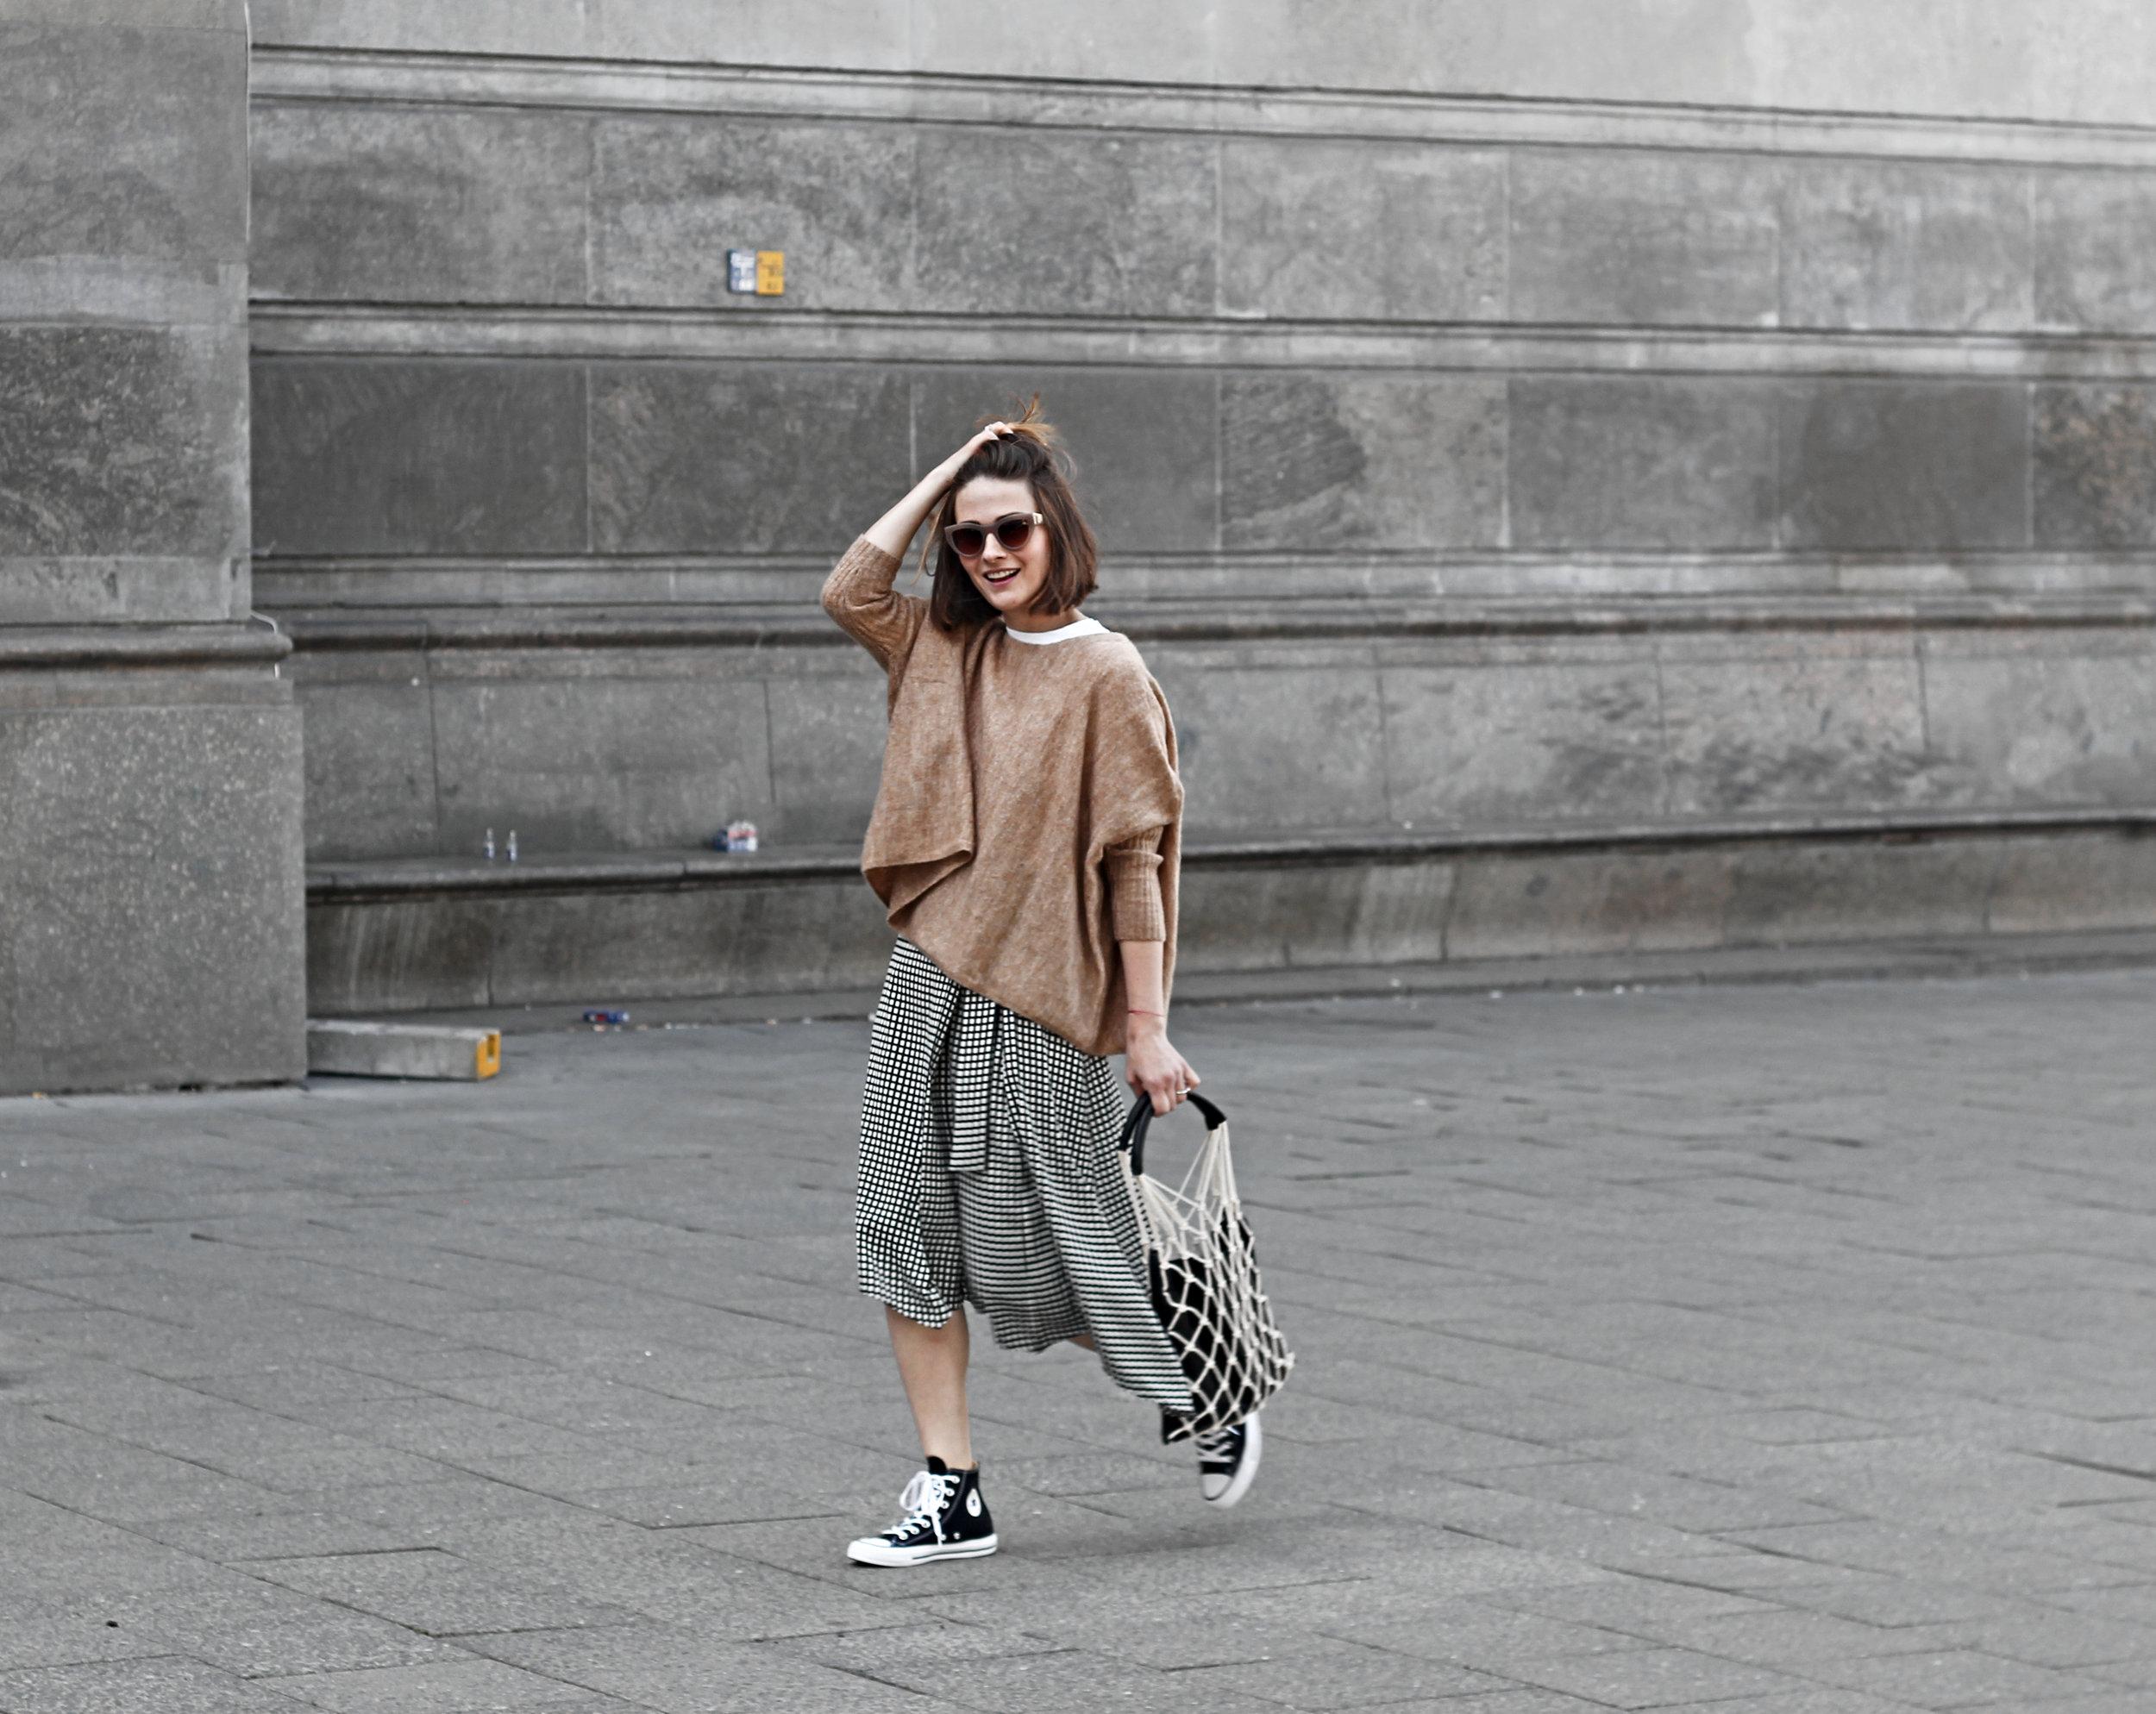 annaporter-fishnet-bag-camel-pullover-converse-high-sneakers-komono-sunglasses-3